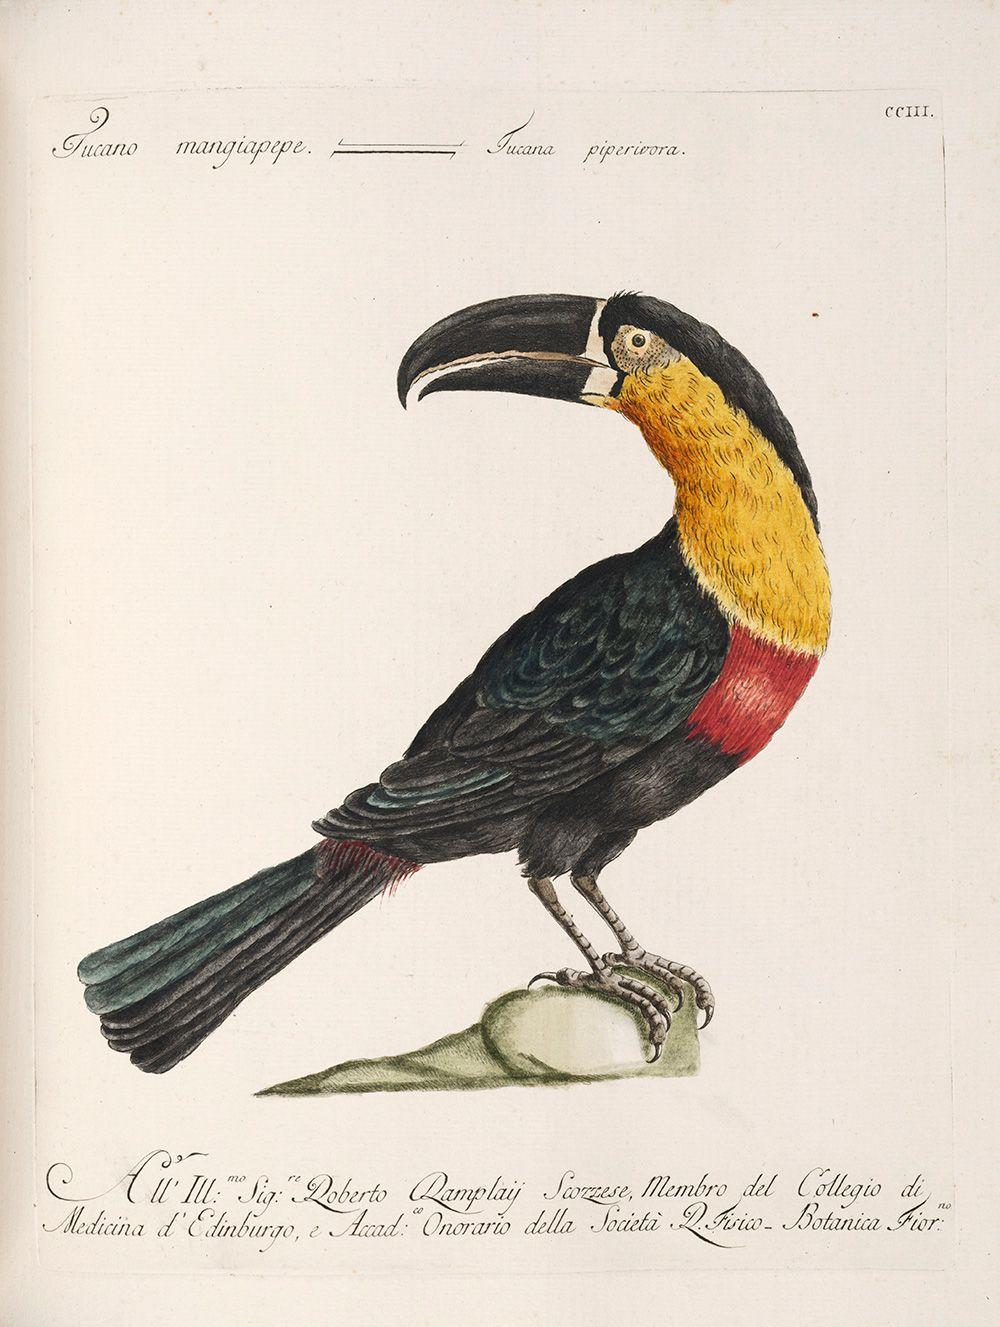 """Mangiapepe Toucan,"" by Saverio Manetti (1767-1776)"